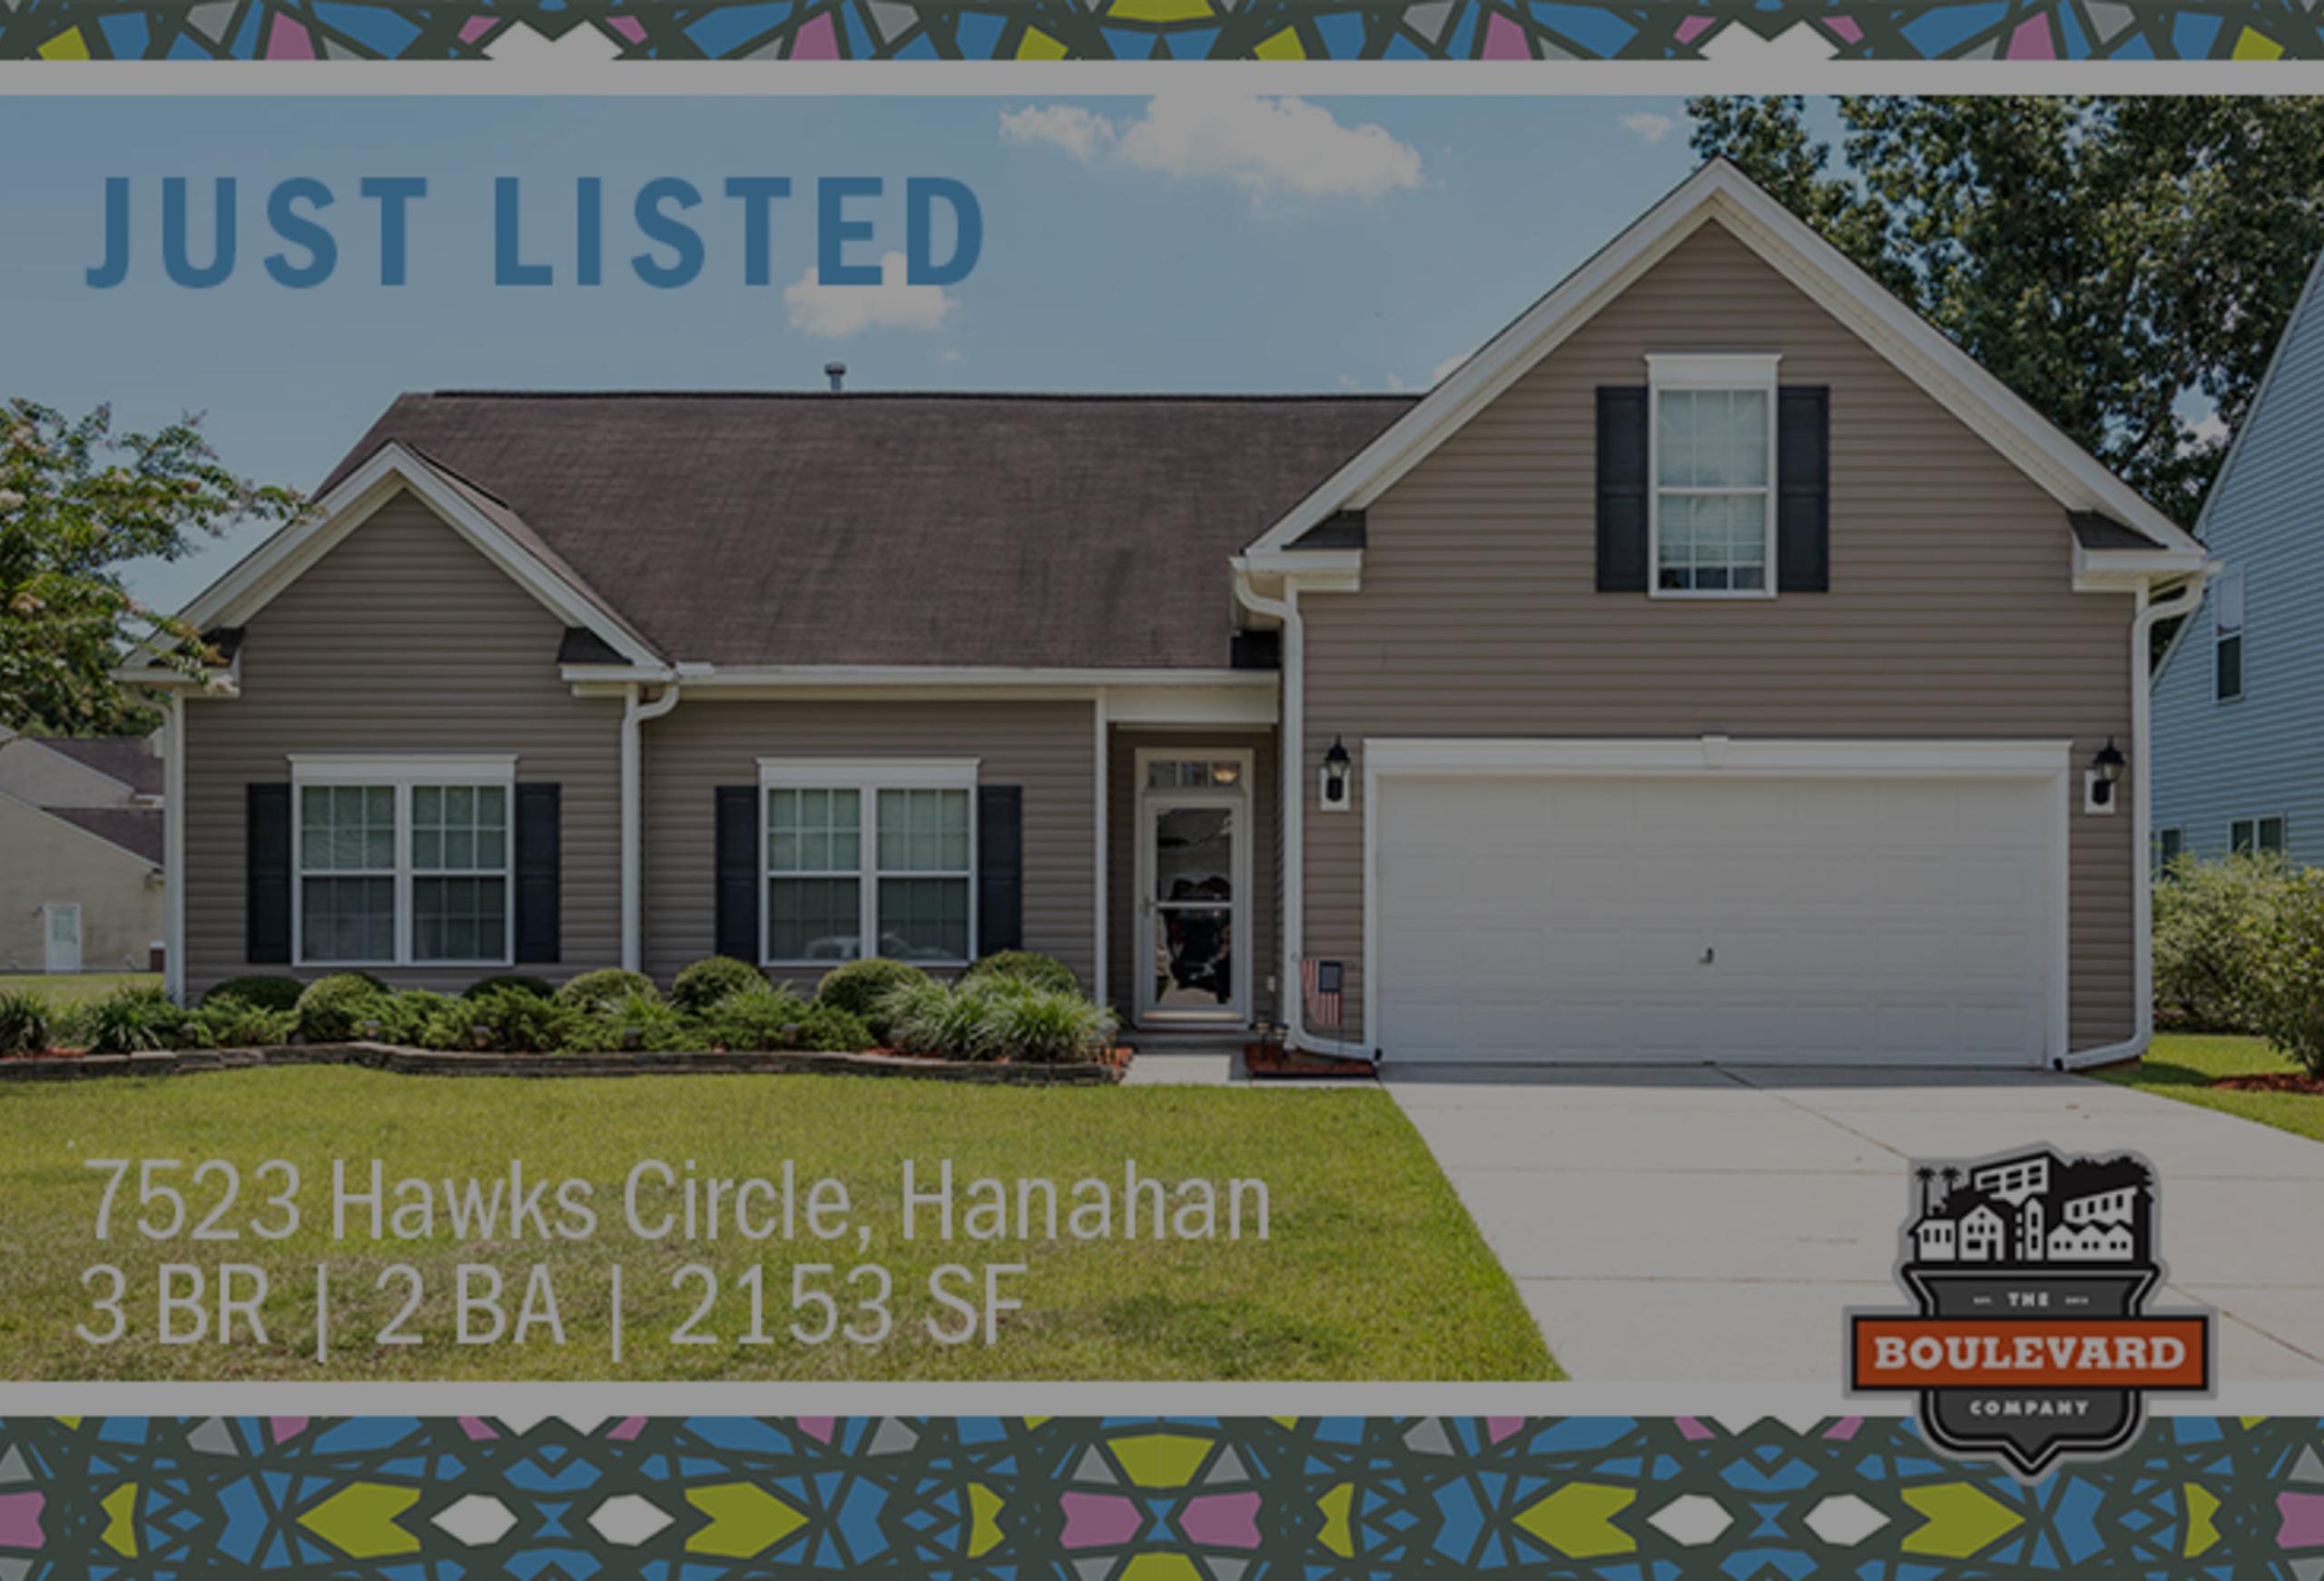 new listing: 7523 Hawks Circle in Hanahan, SC